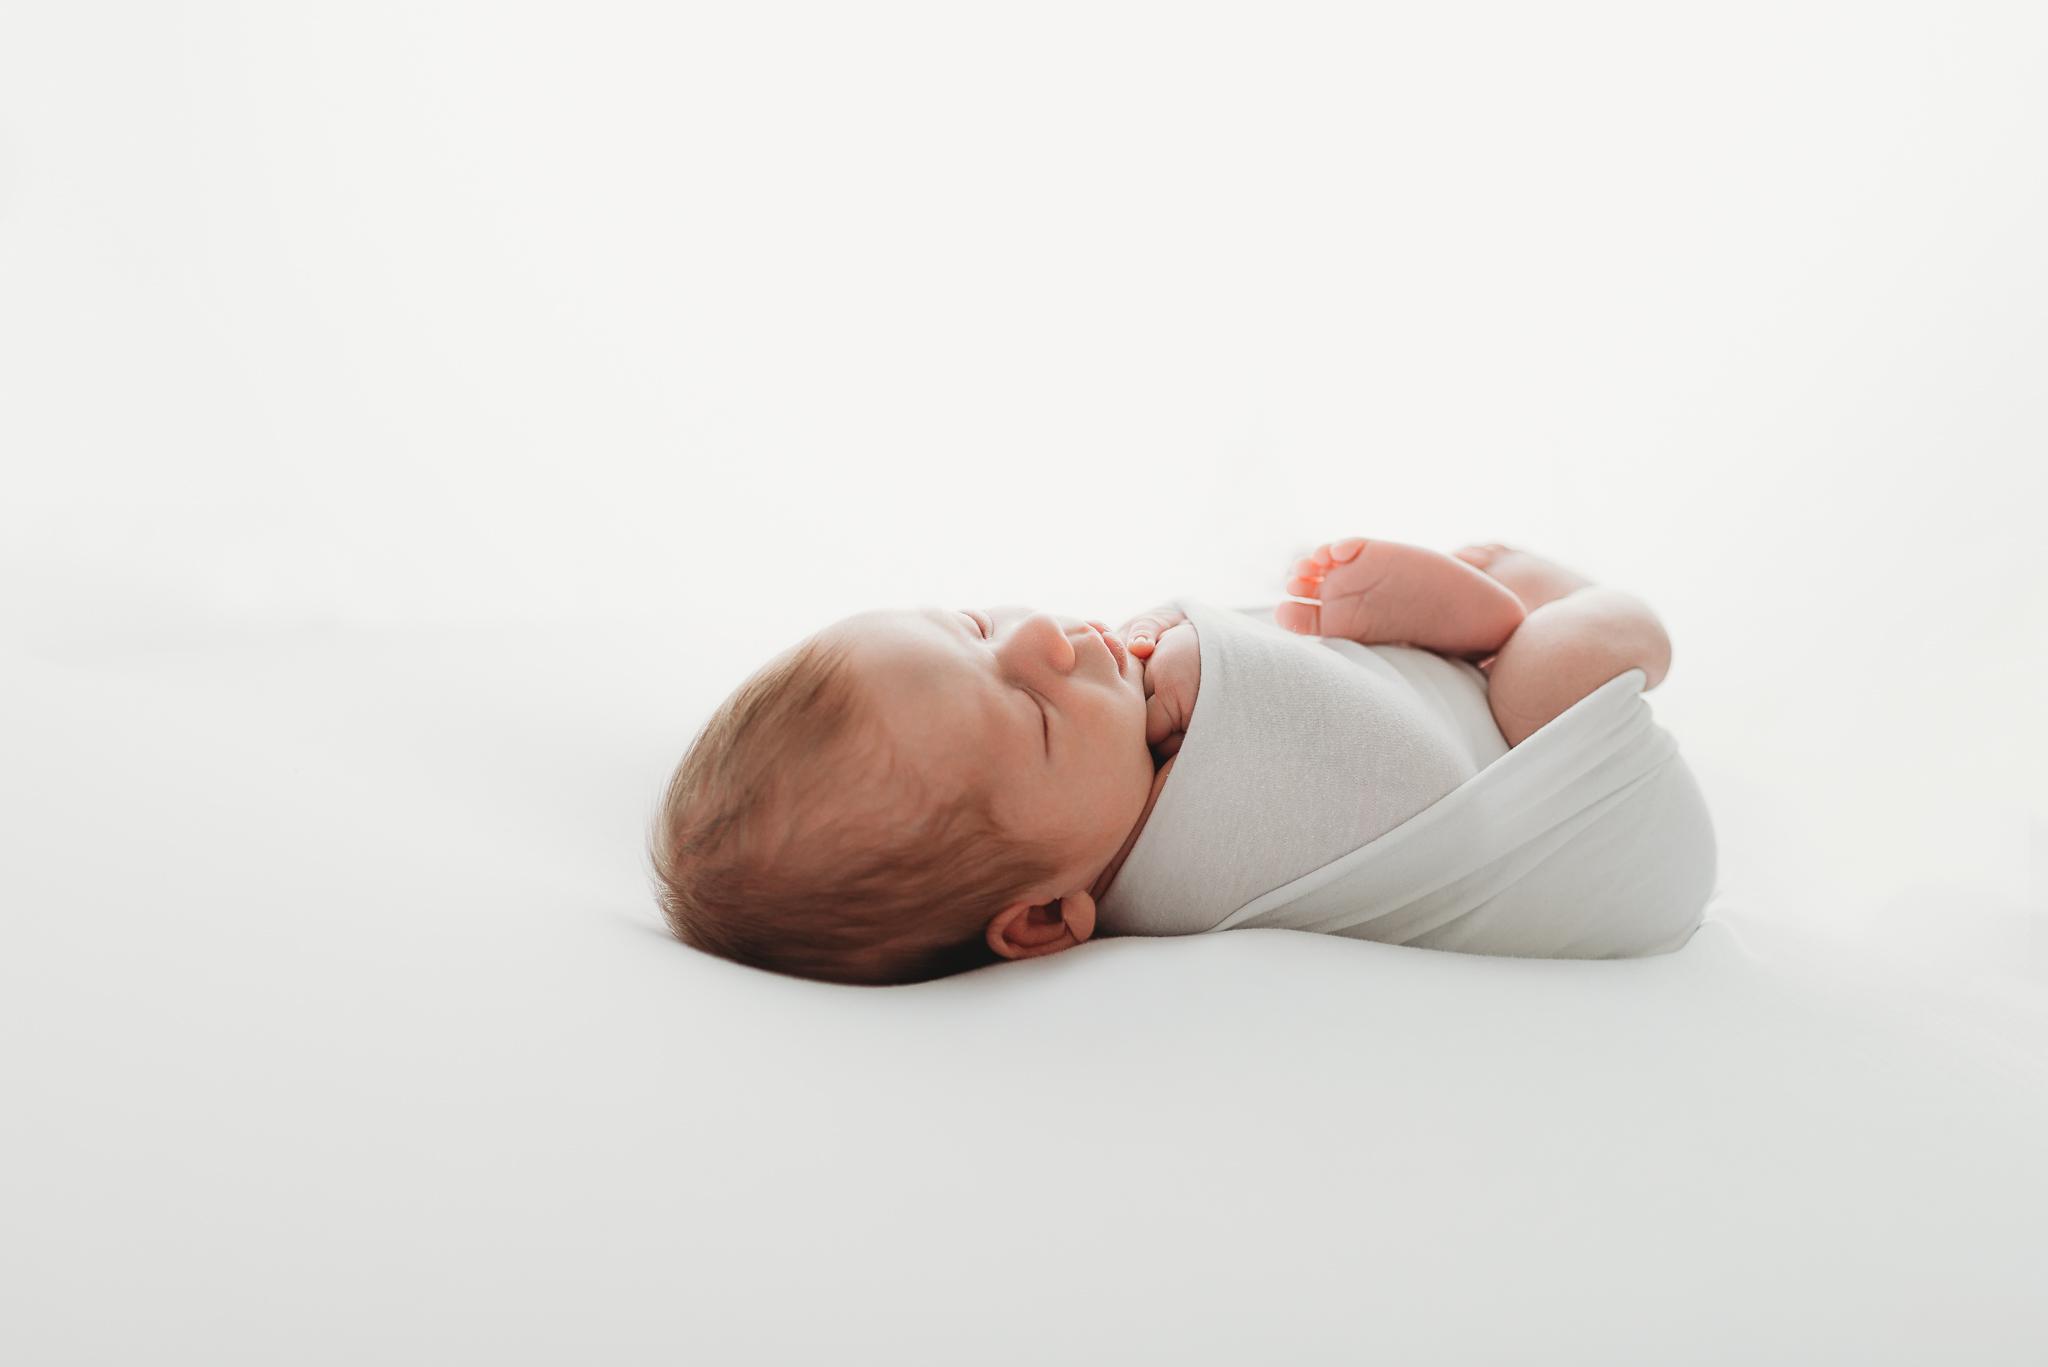 kelowna_newborn_photographer_lifestyle (2 of 1)-7.jpg